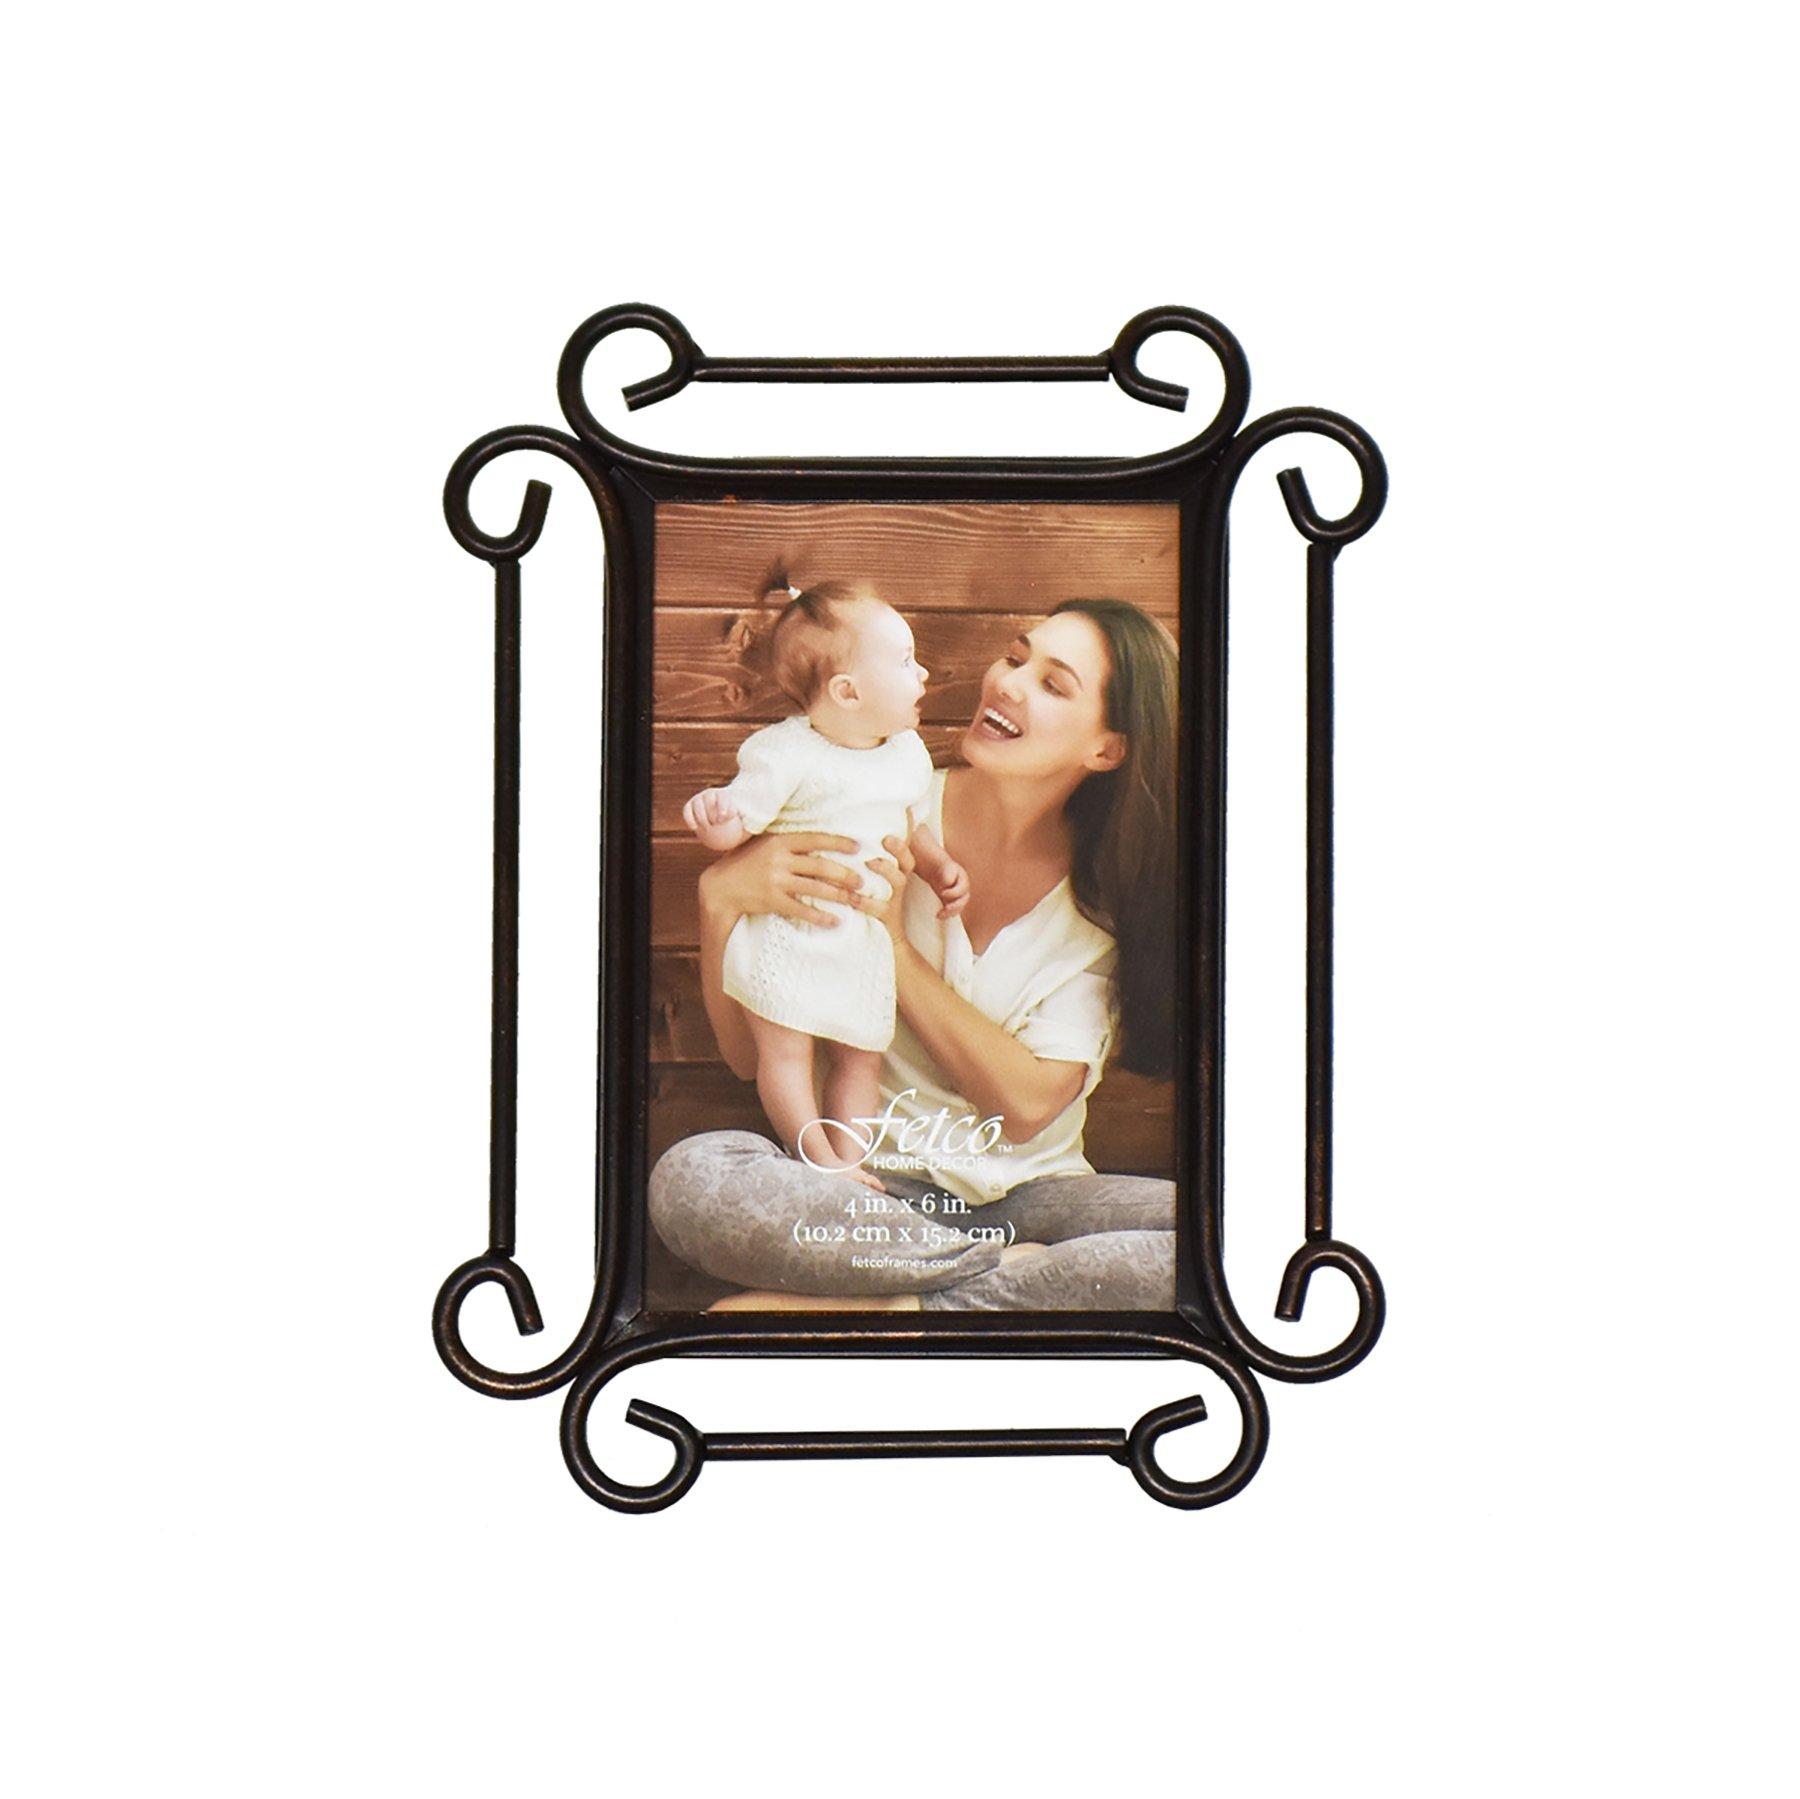 Fetco Home Dcor Alton Bronze 4x6 Picture Frame